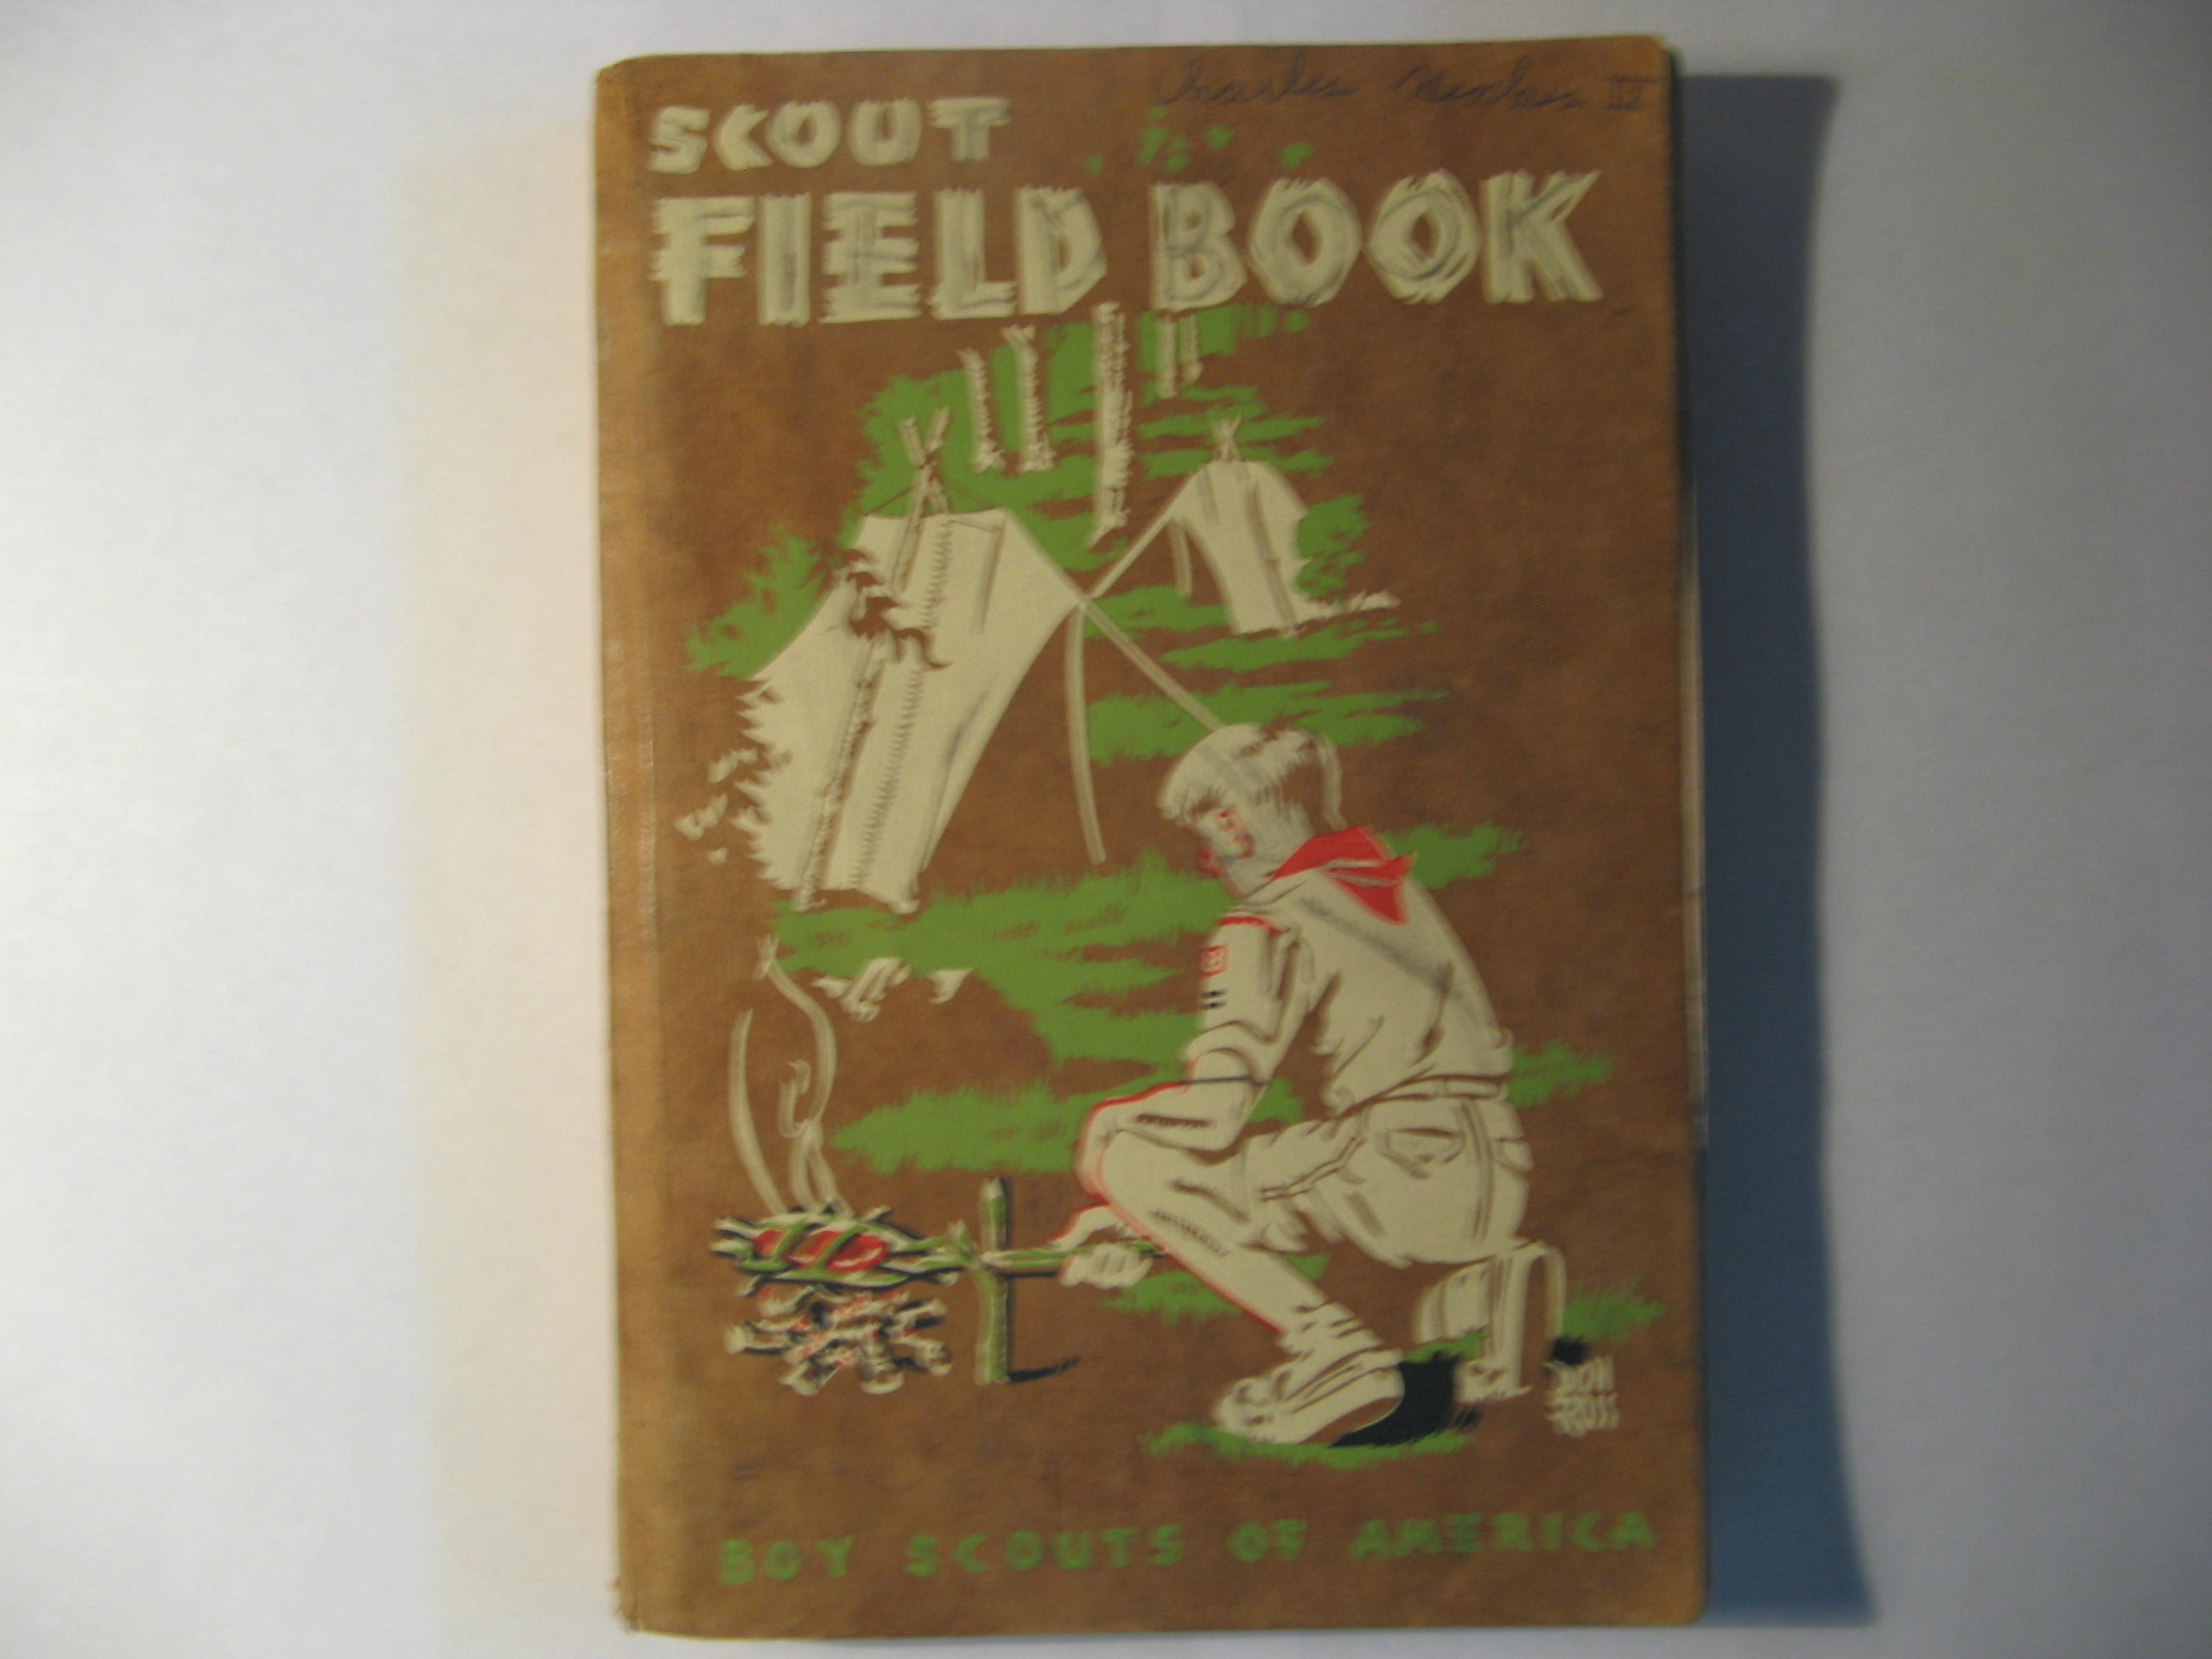 Bsa fieldbook first edition